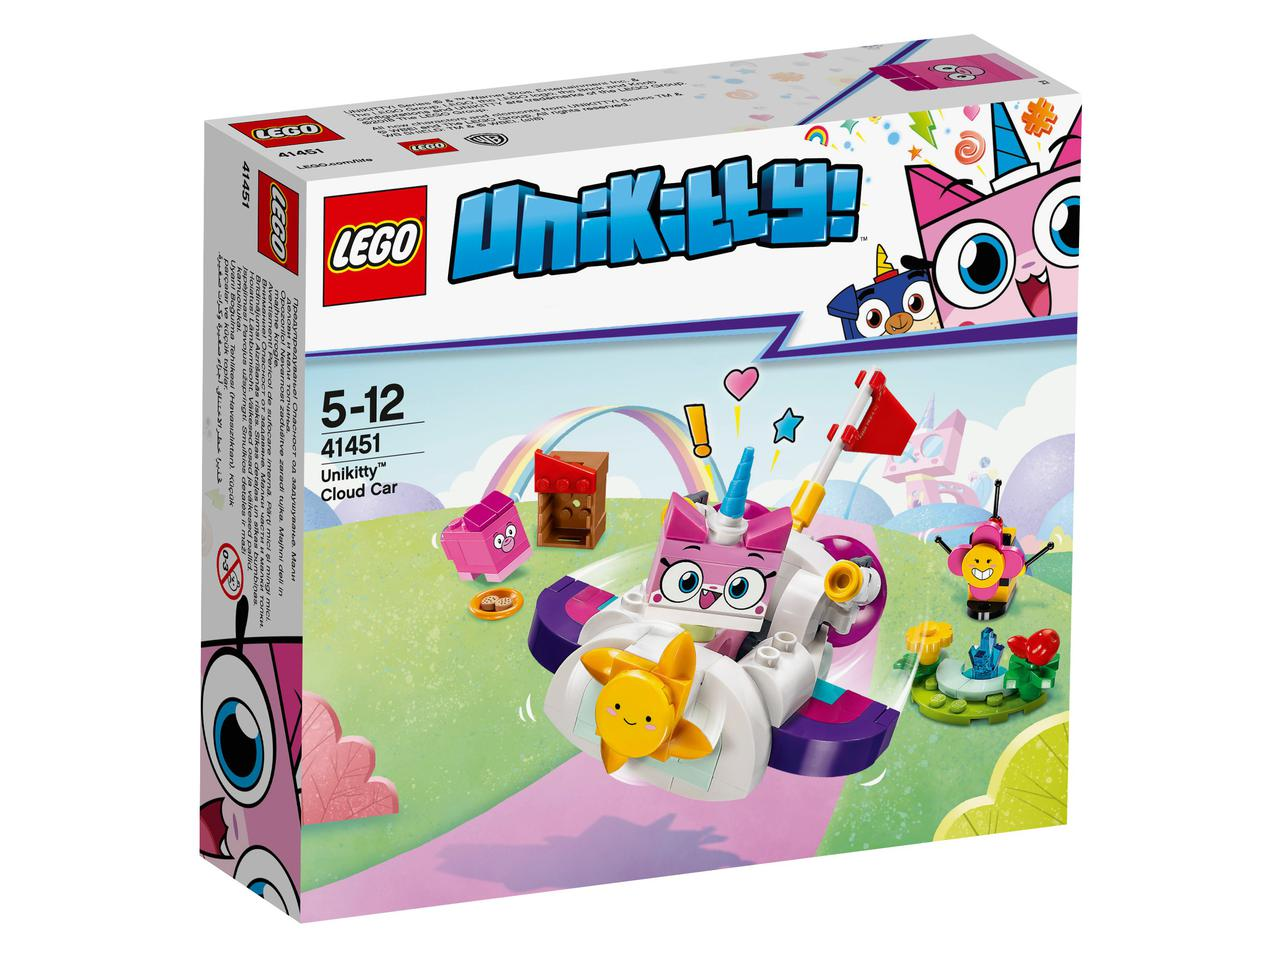 41451 Lego Unikitty Машина-облако Юникитти, Лего Юникитти